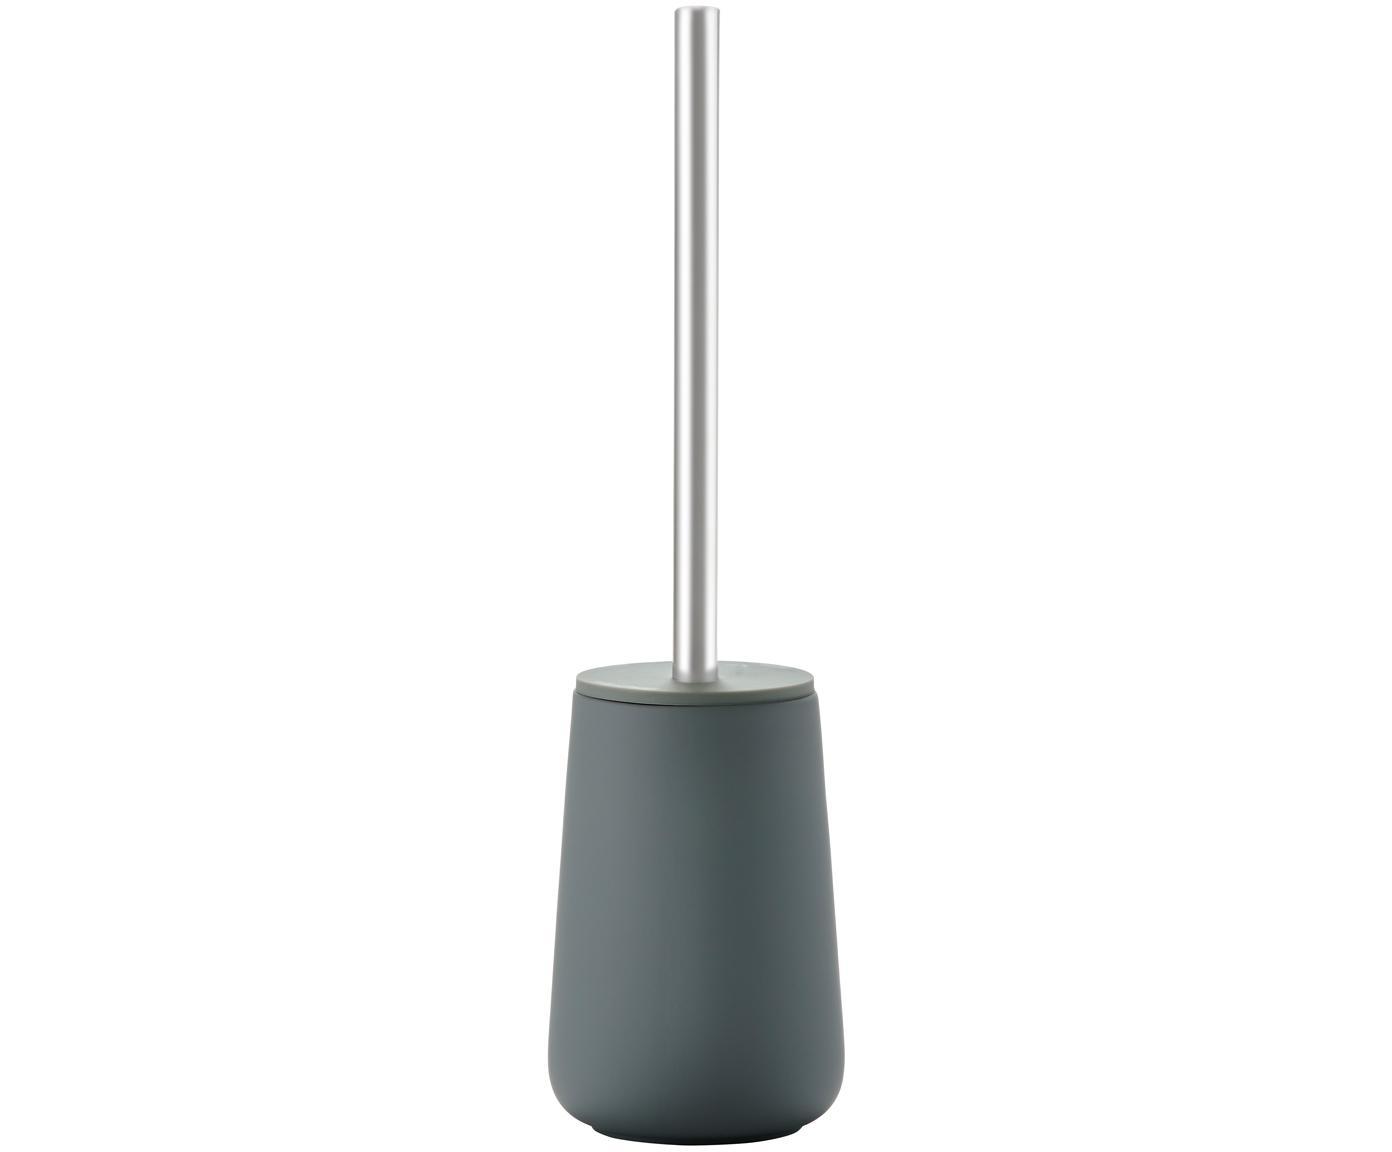 Toiletborstel Brush, Houder: porselein, Mat grijs, edelstaalkleurig, Ø 10 x H 43 cm